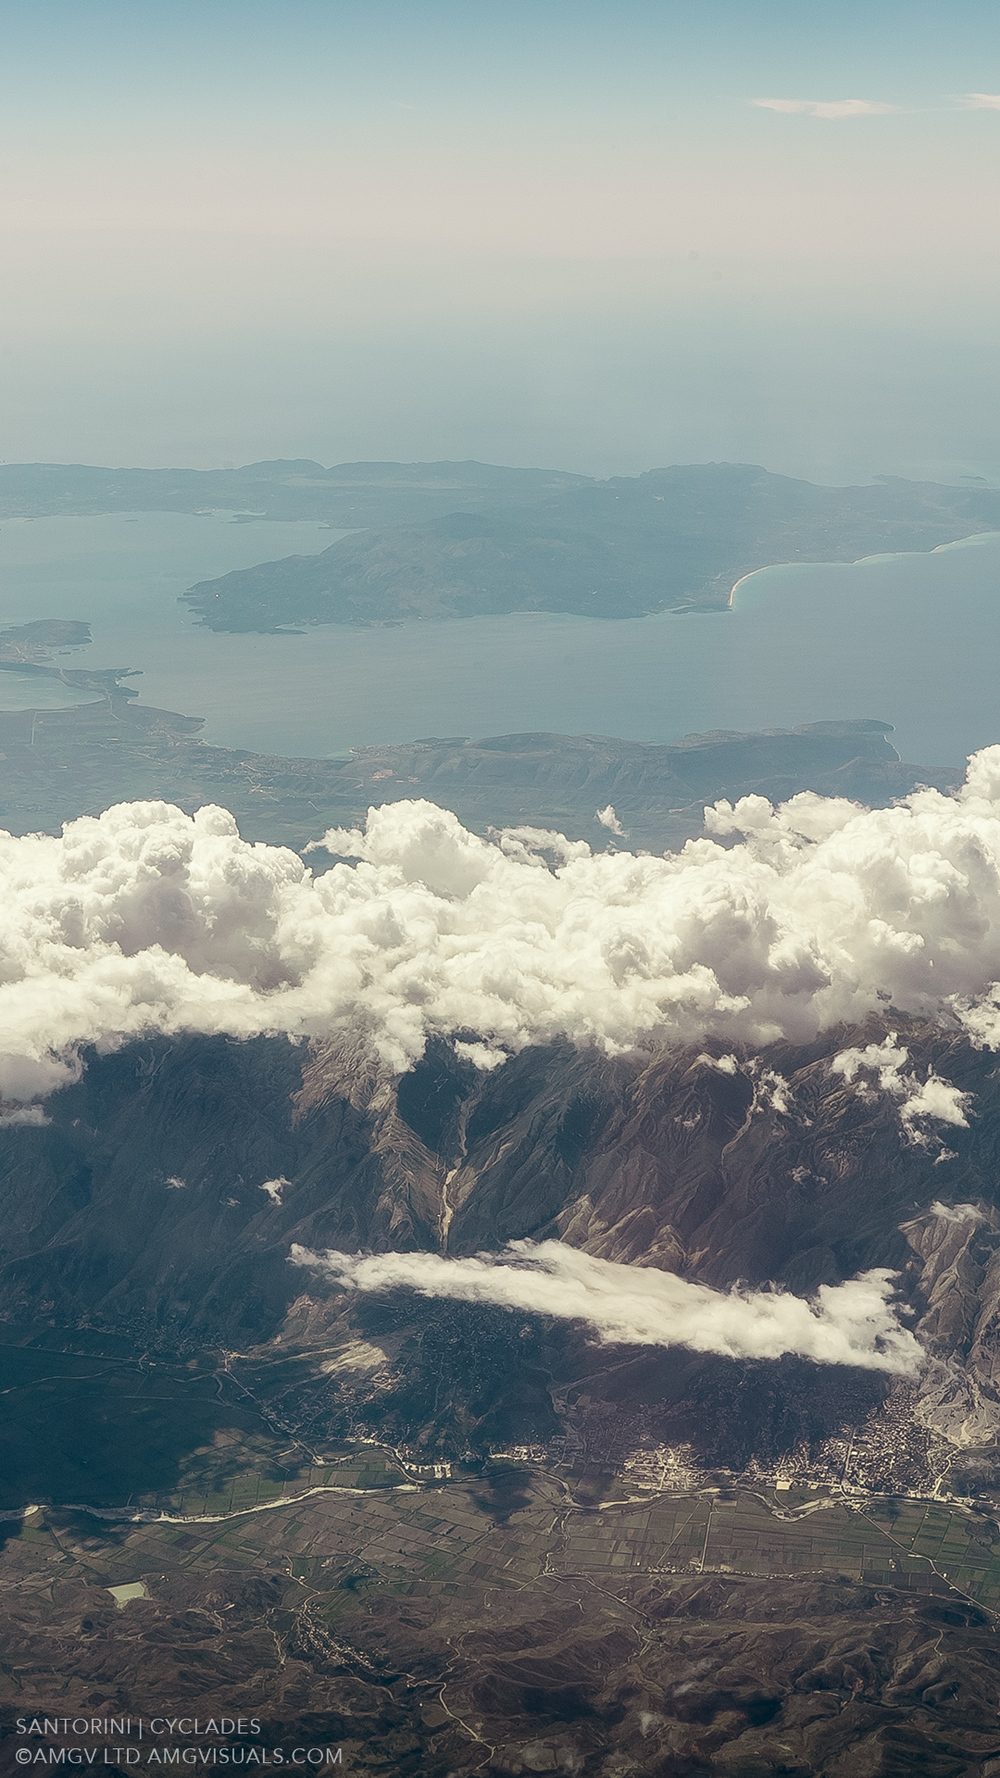 ©AMGV-LTD-Santorini+Cyclades-4.jpg